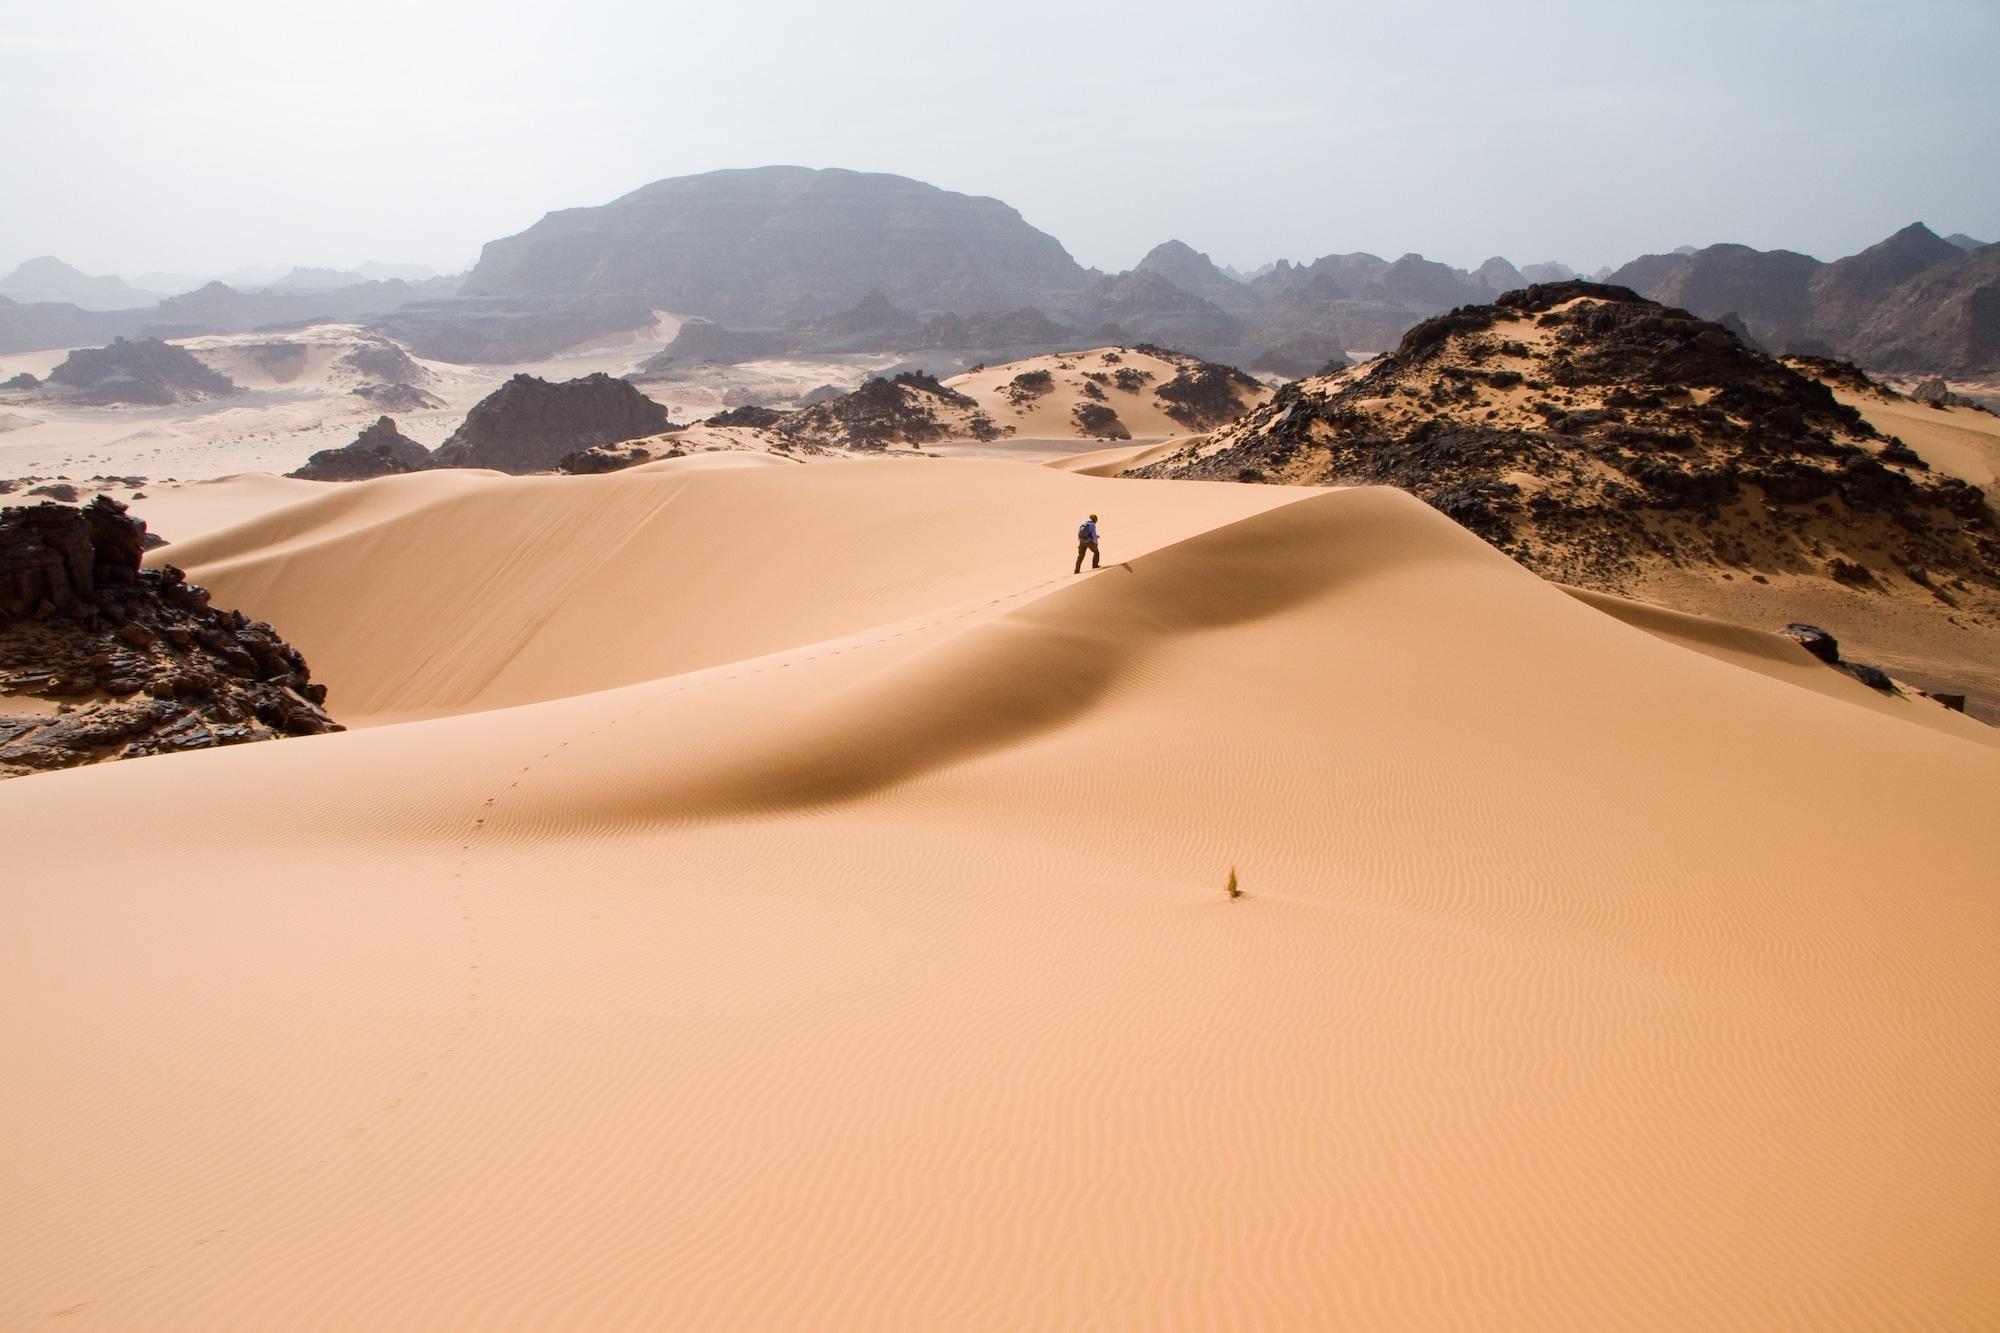 sahara scene